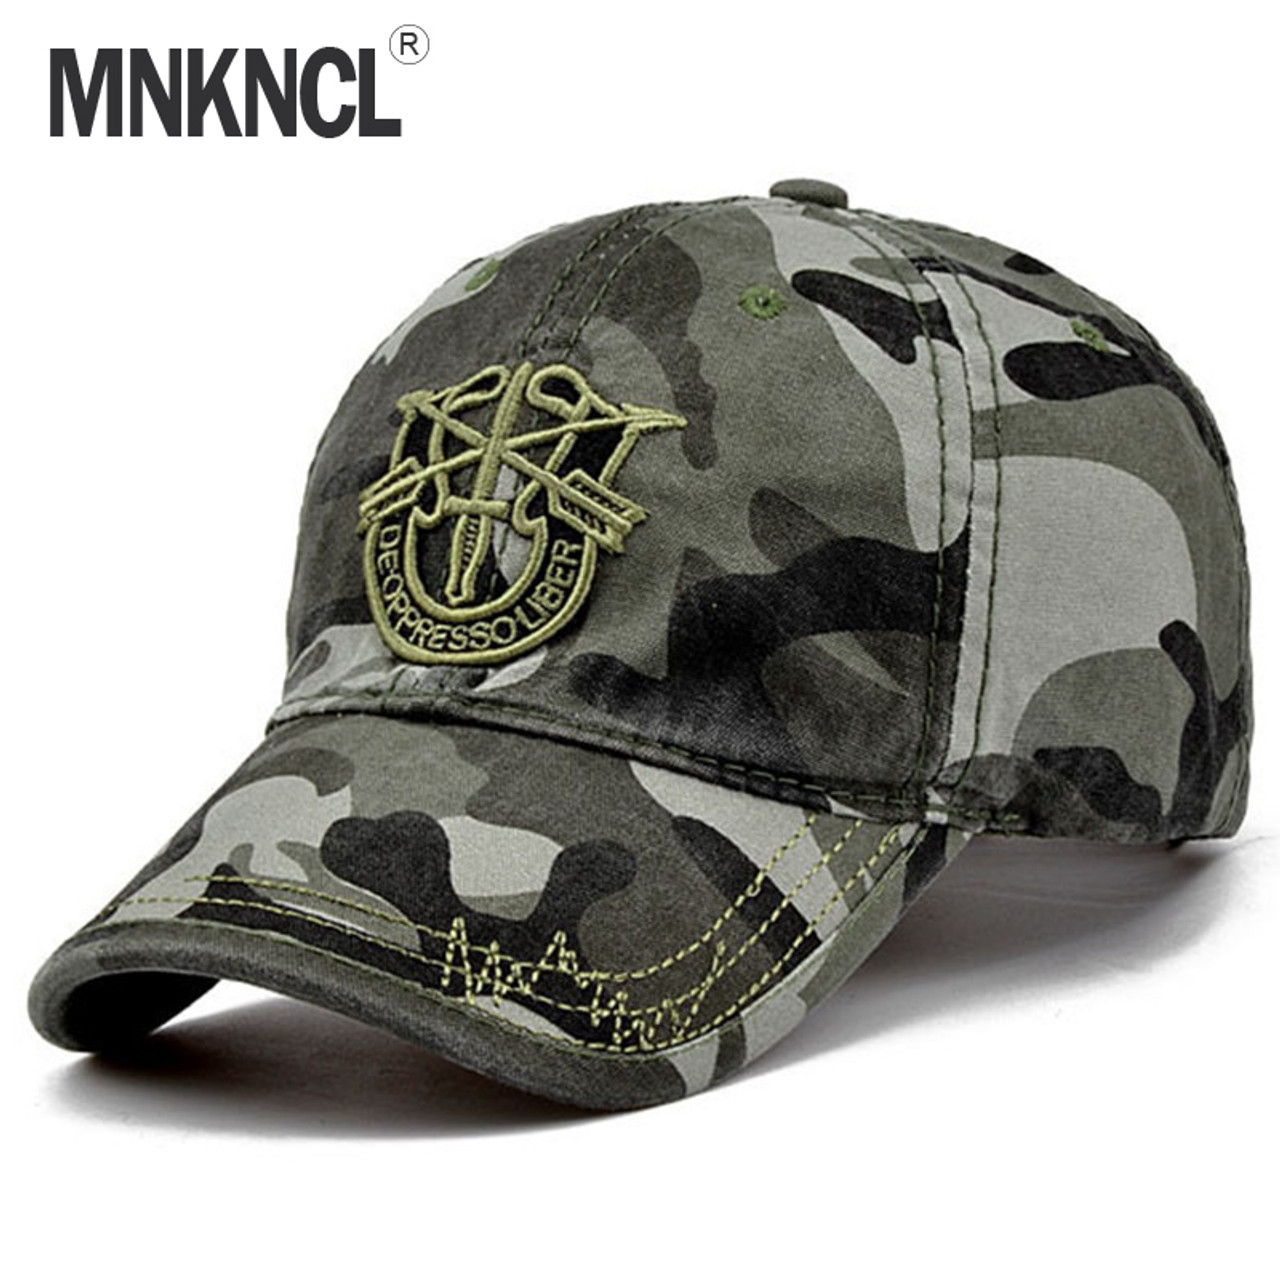 045cc3fc1c94b 2017 New Brand Fashion Army Camo Baseball Cap Men Women Tactical Sun Hat  Letter Adjustable Camouflage ...